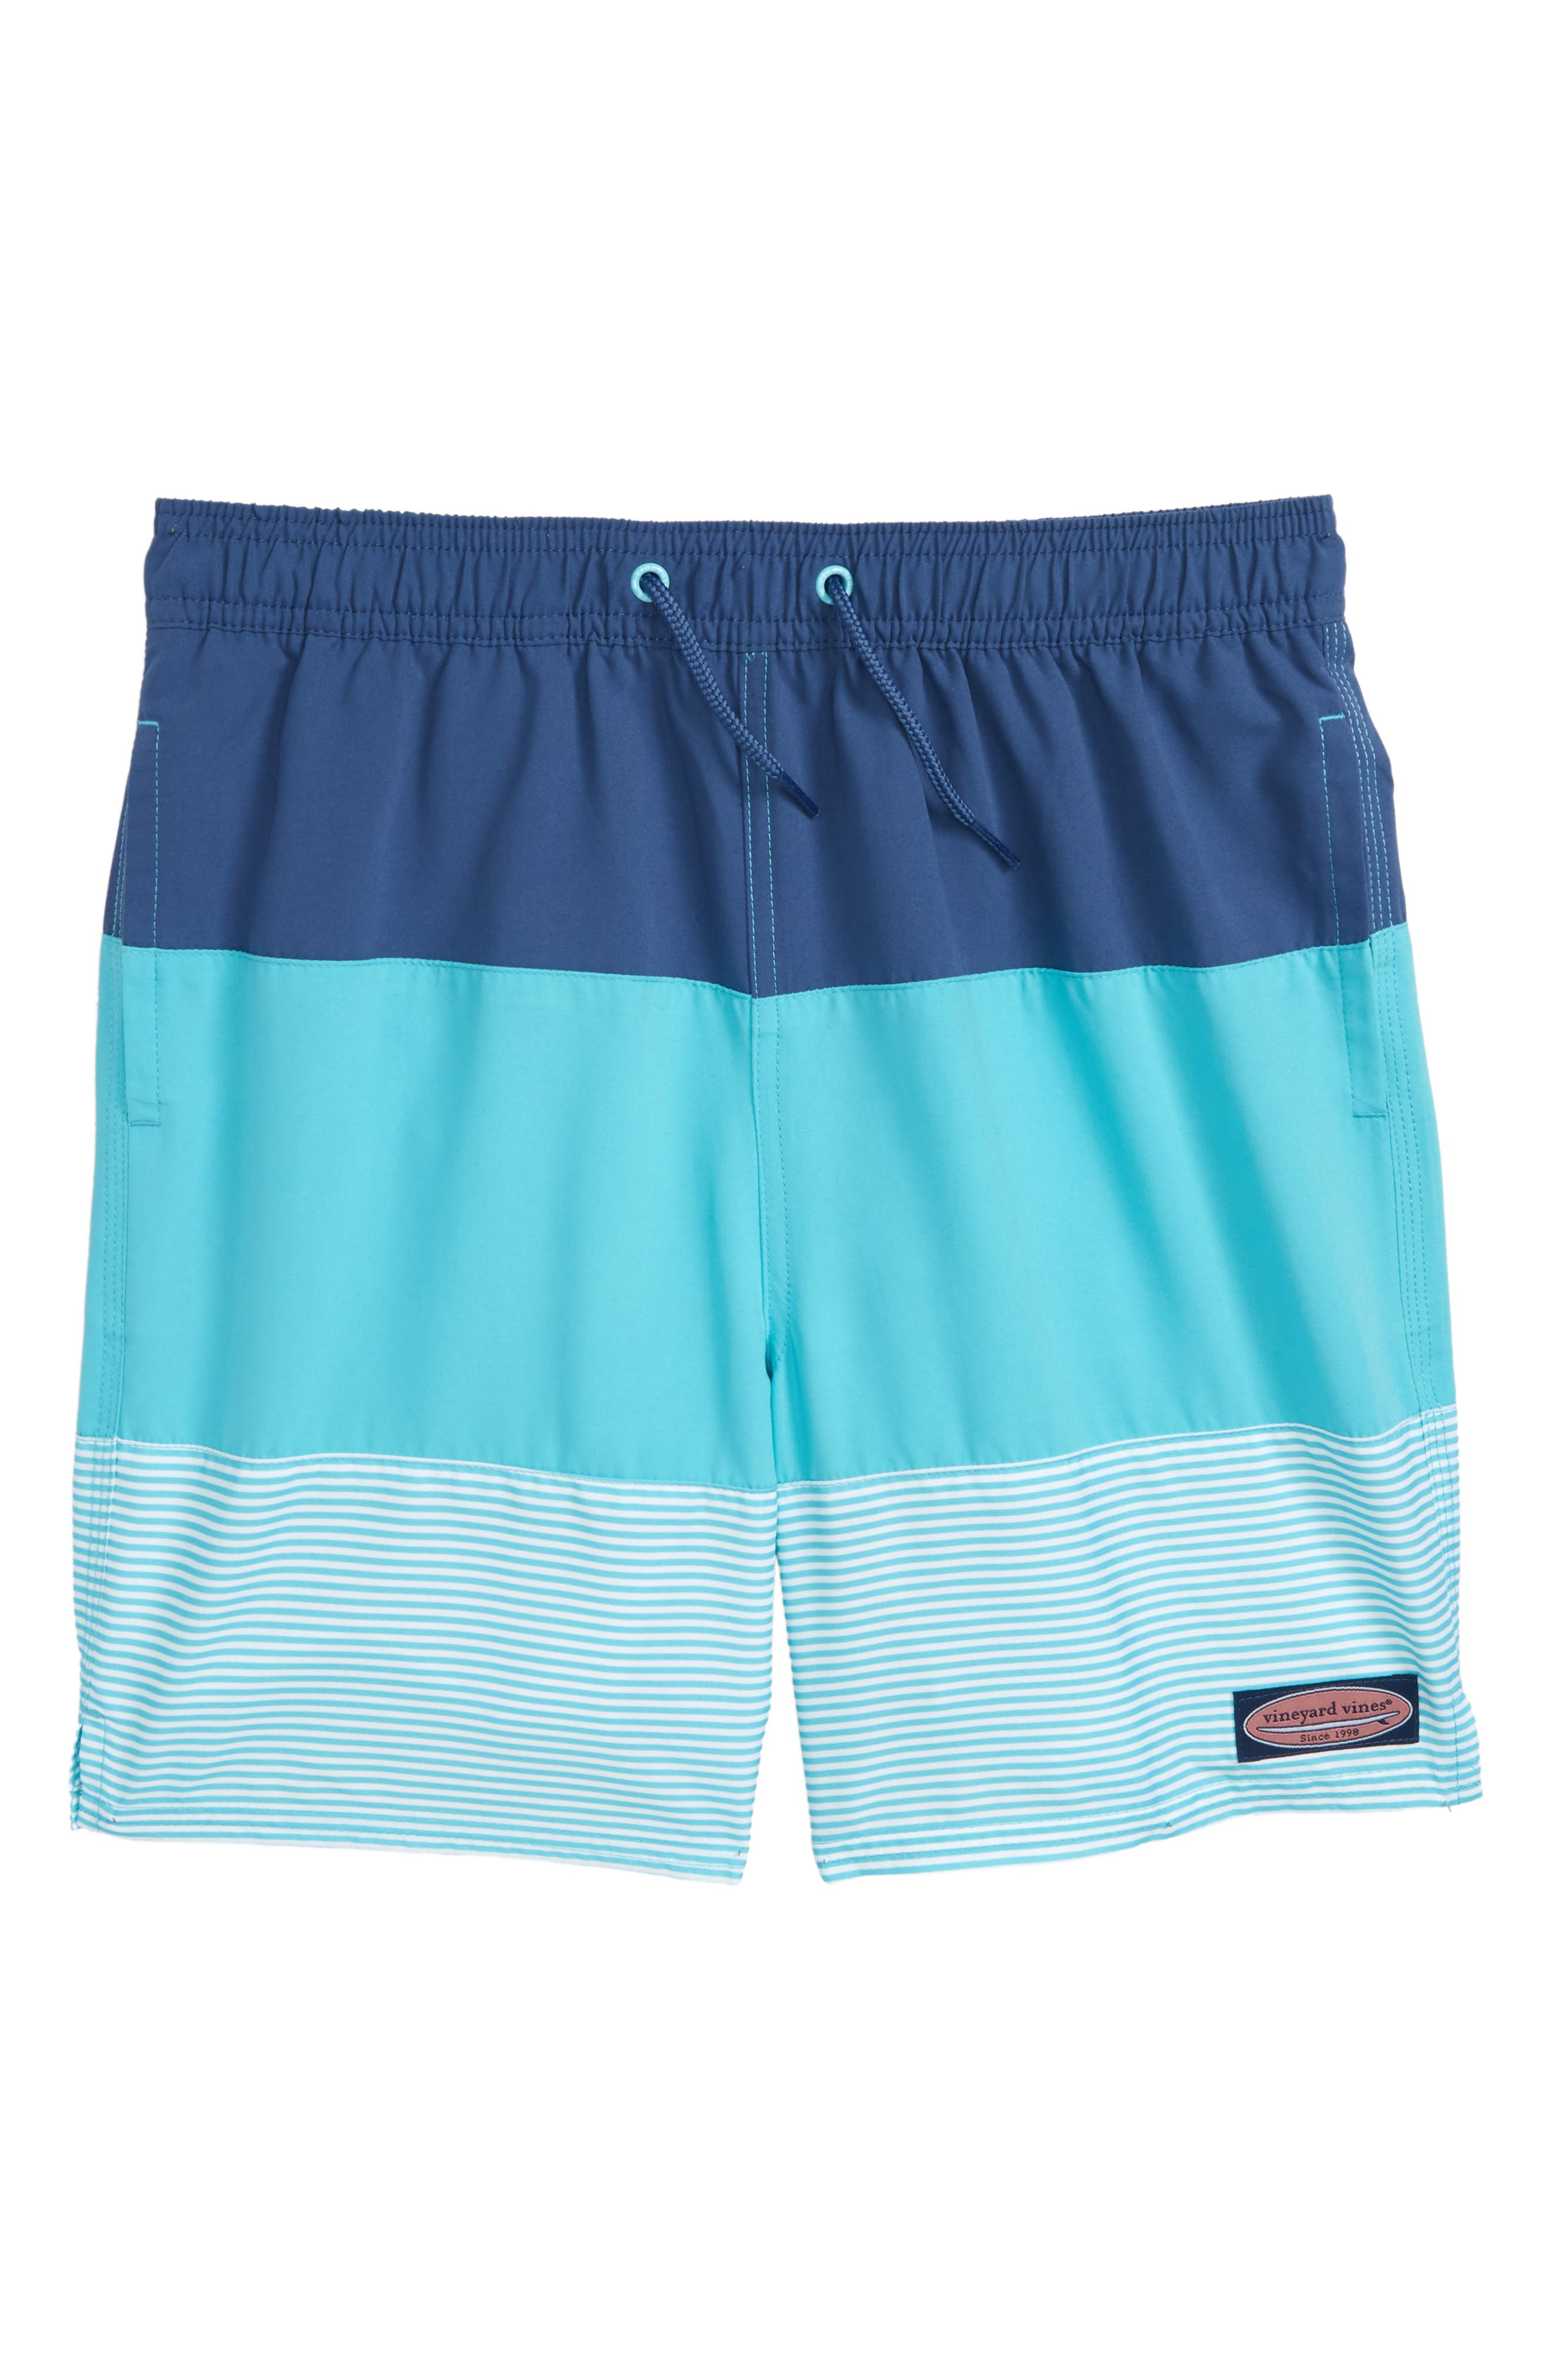 Chappy Stripe Swim Trunks,                         Main,                         color, 440